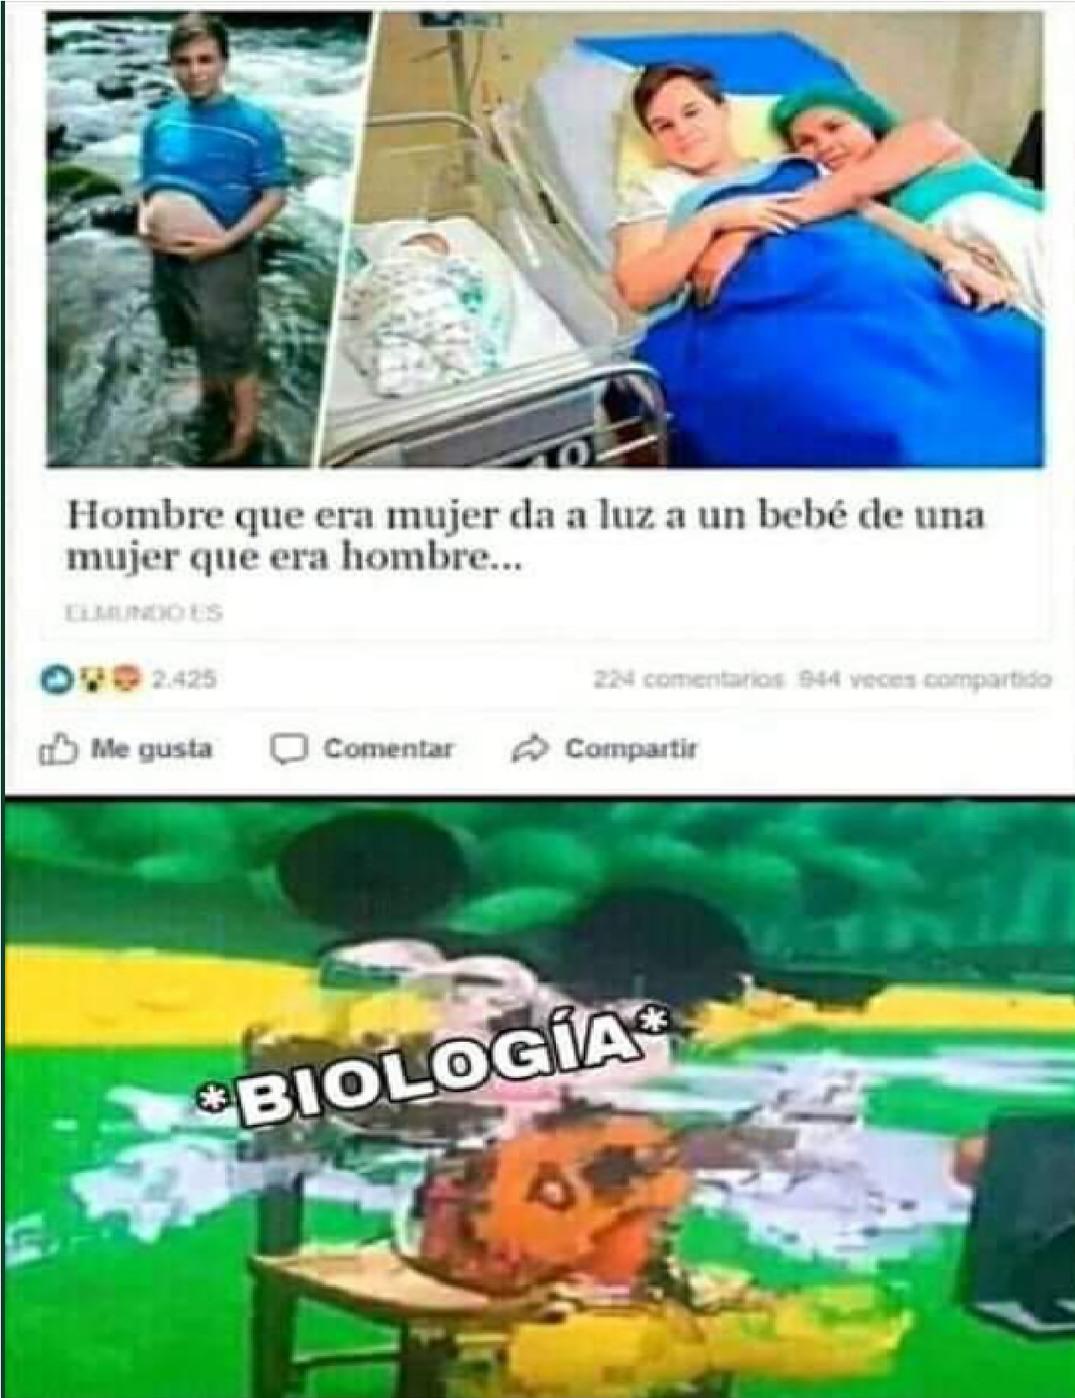 Biologia - meme